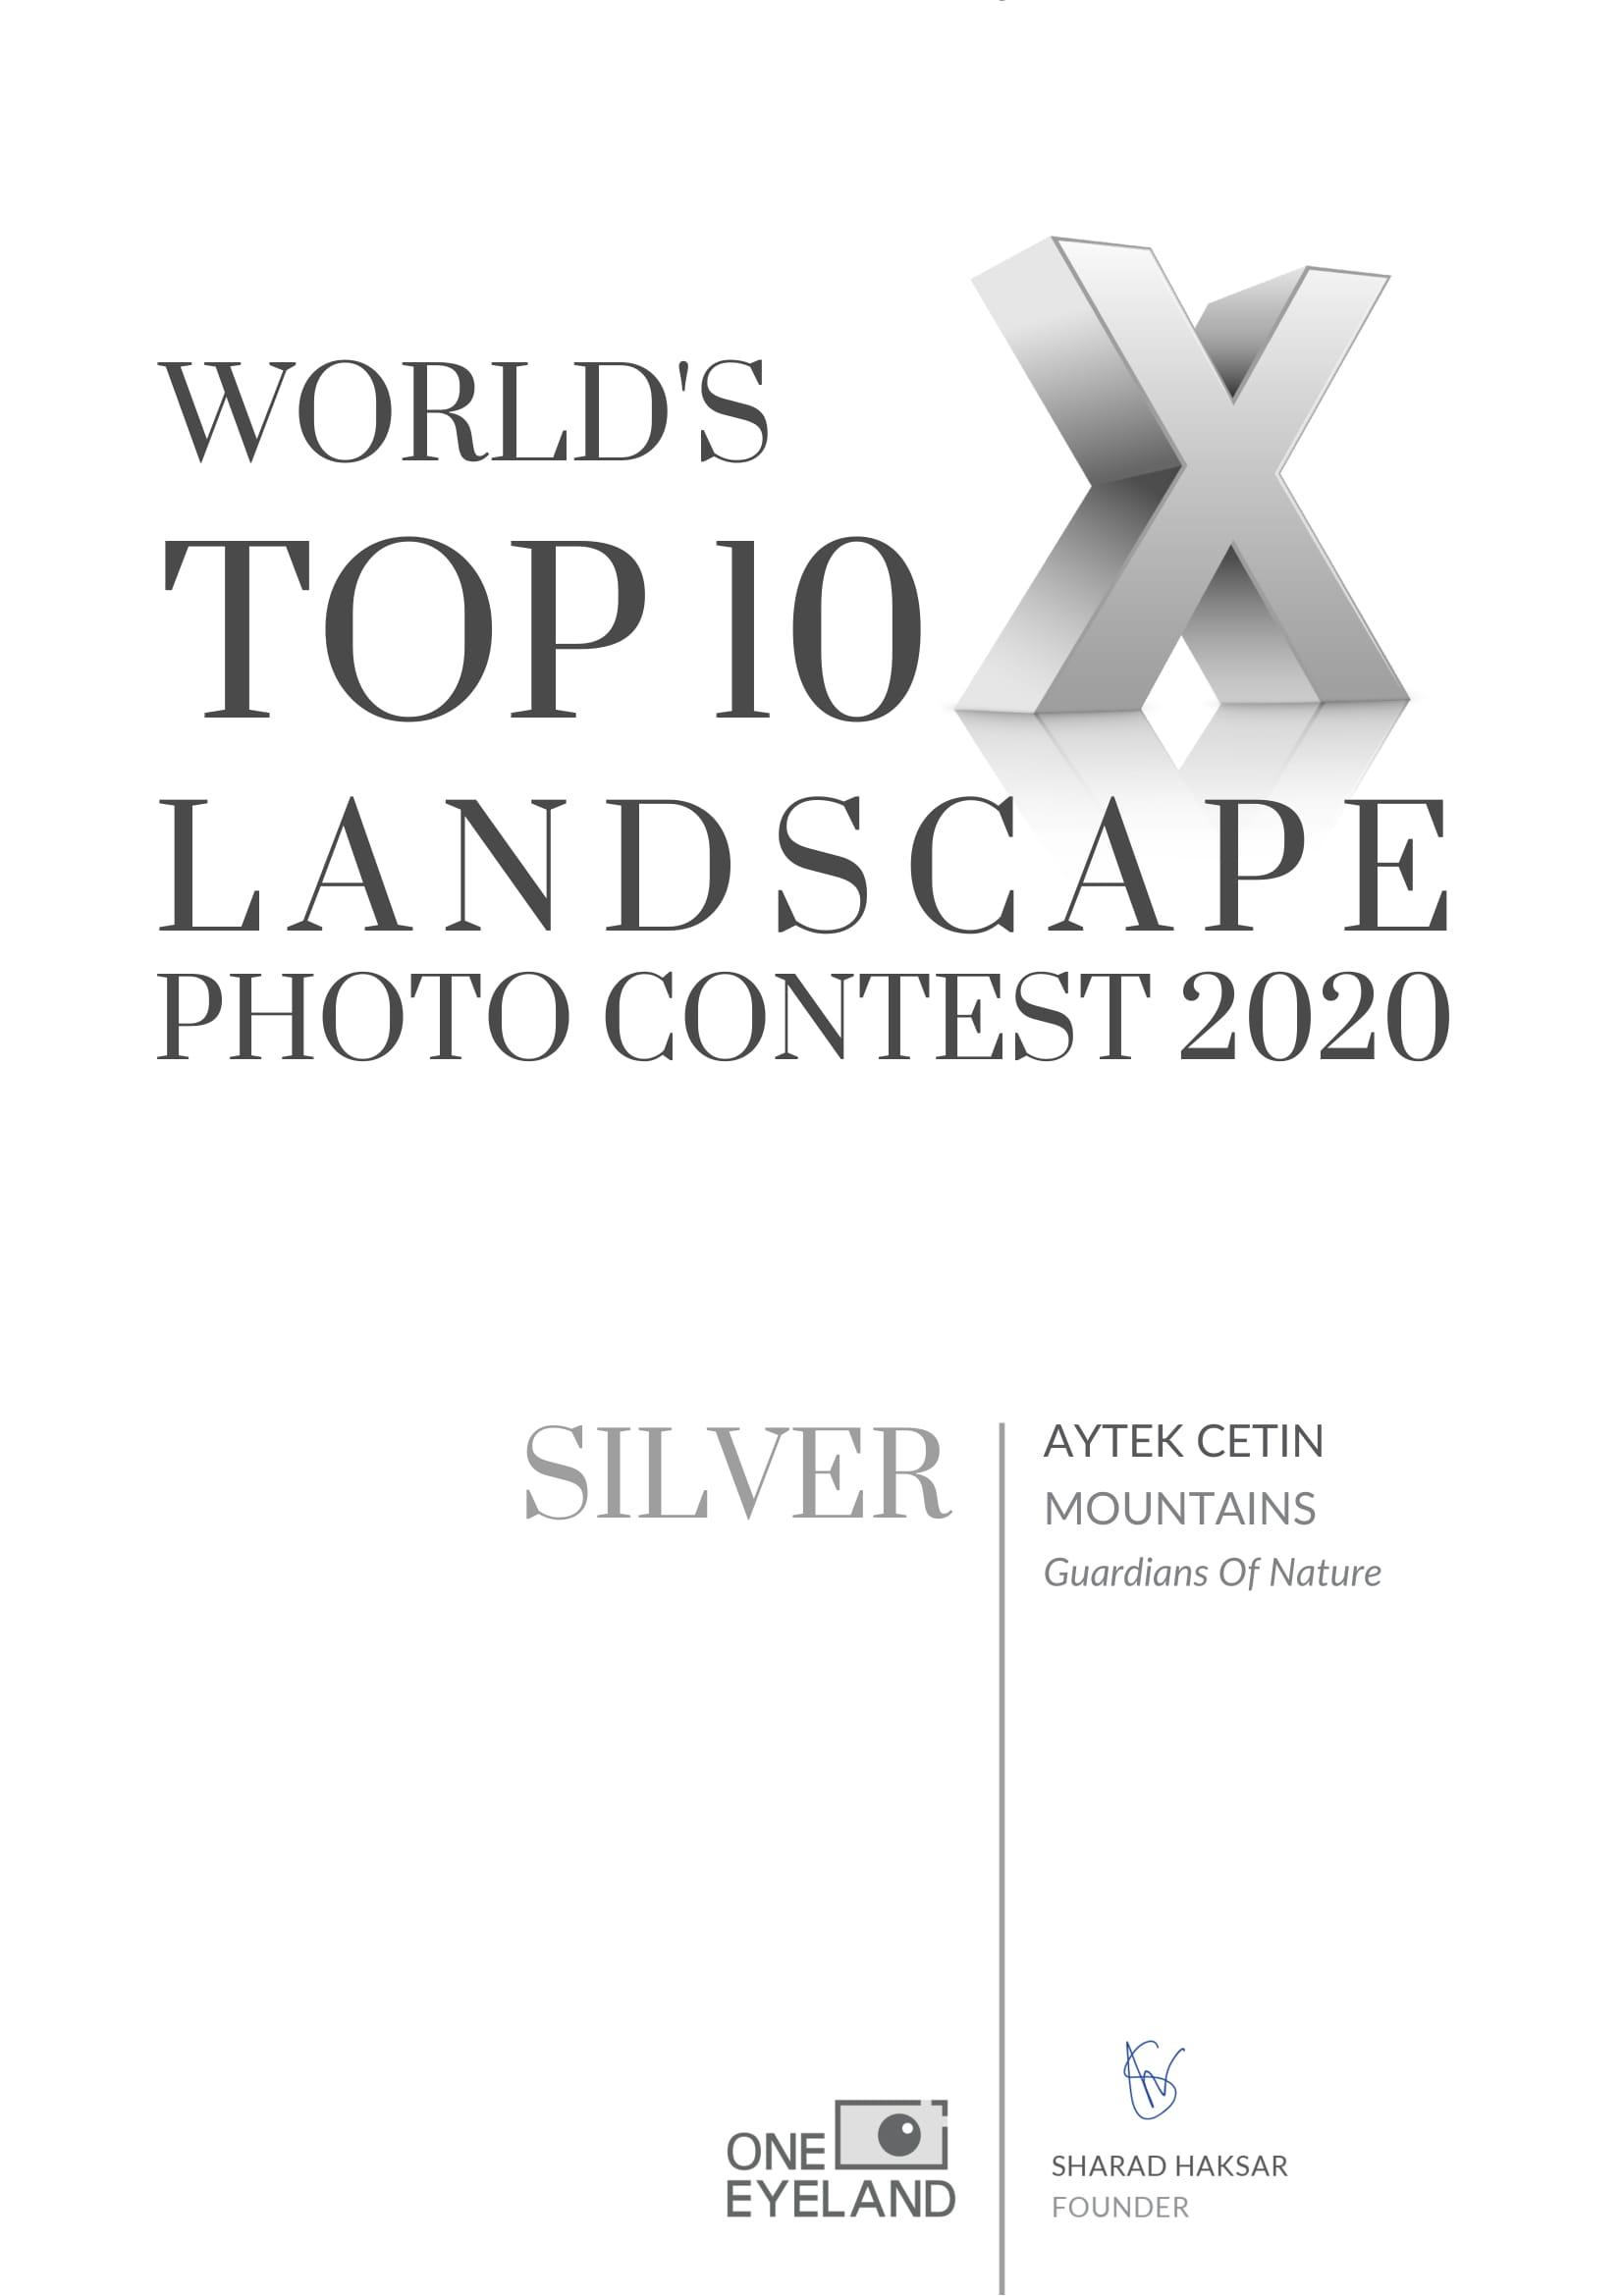 aytek-cetin-silver-landscape-mountains-2020-1